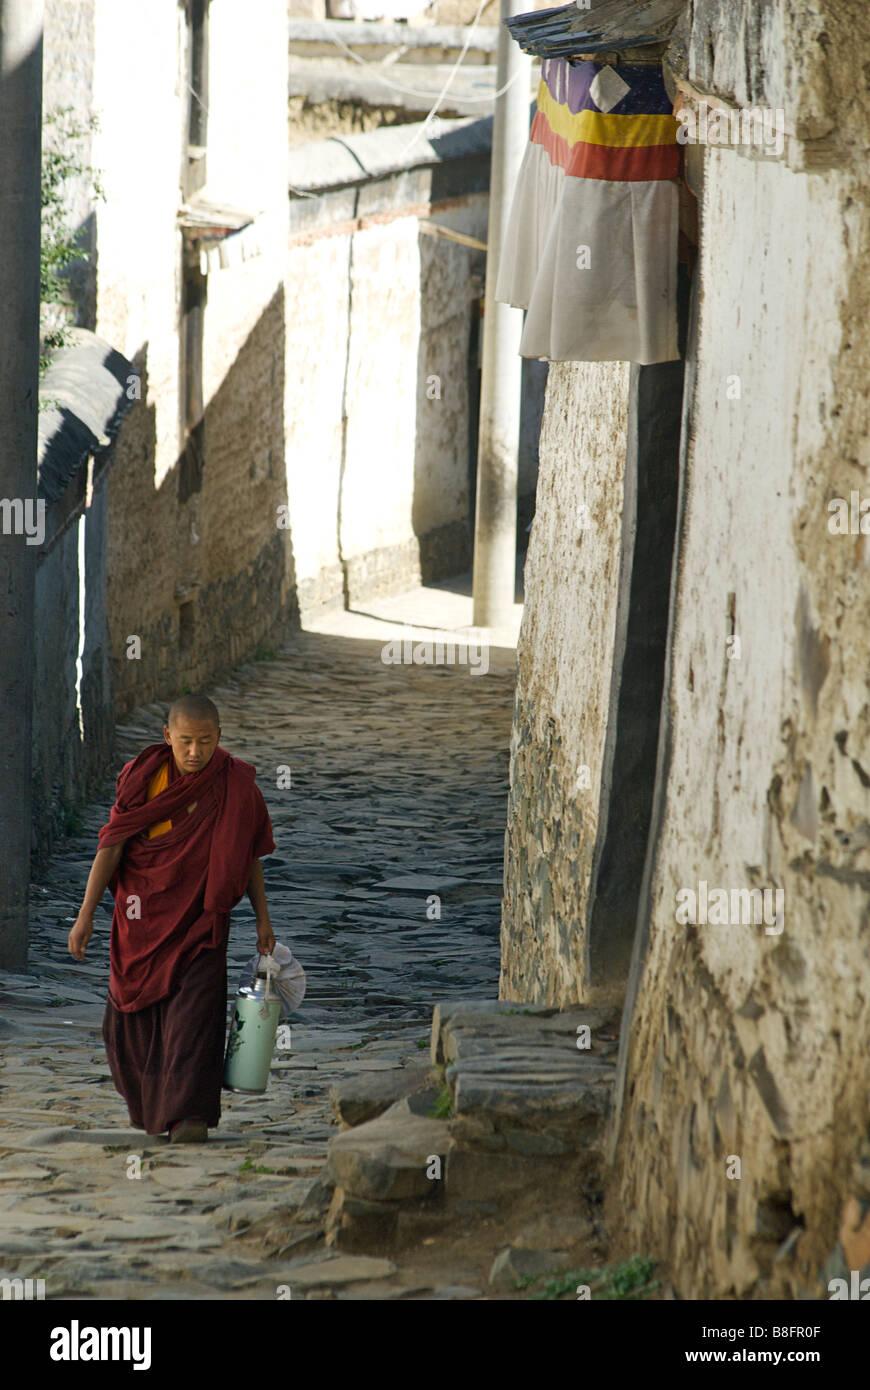 Tibetan monk walking along the narrow streets of  Tashilunpo monastery, Shigatse,Tibet - Stock Image